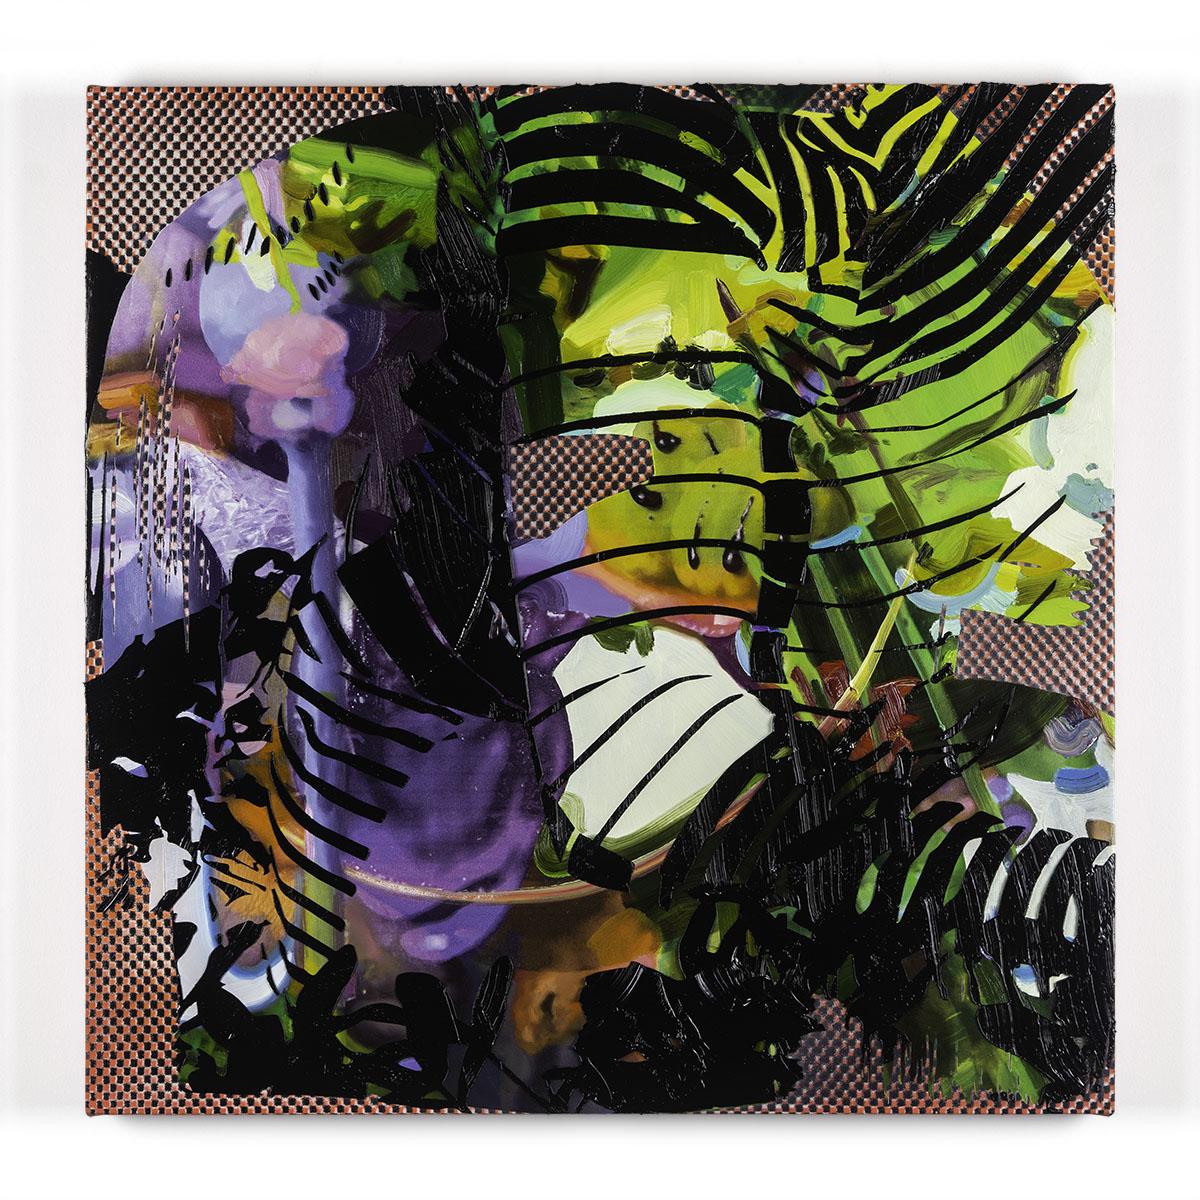 Jimmy Baker, American artist, painting, digital printing : Politics of Gardening 3 painting